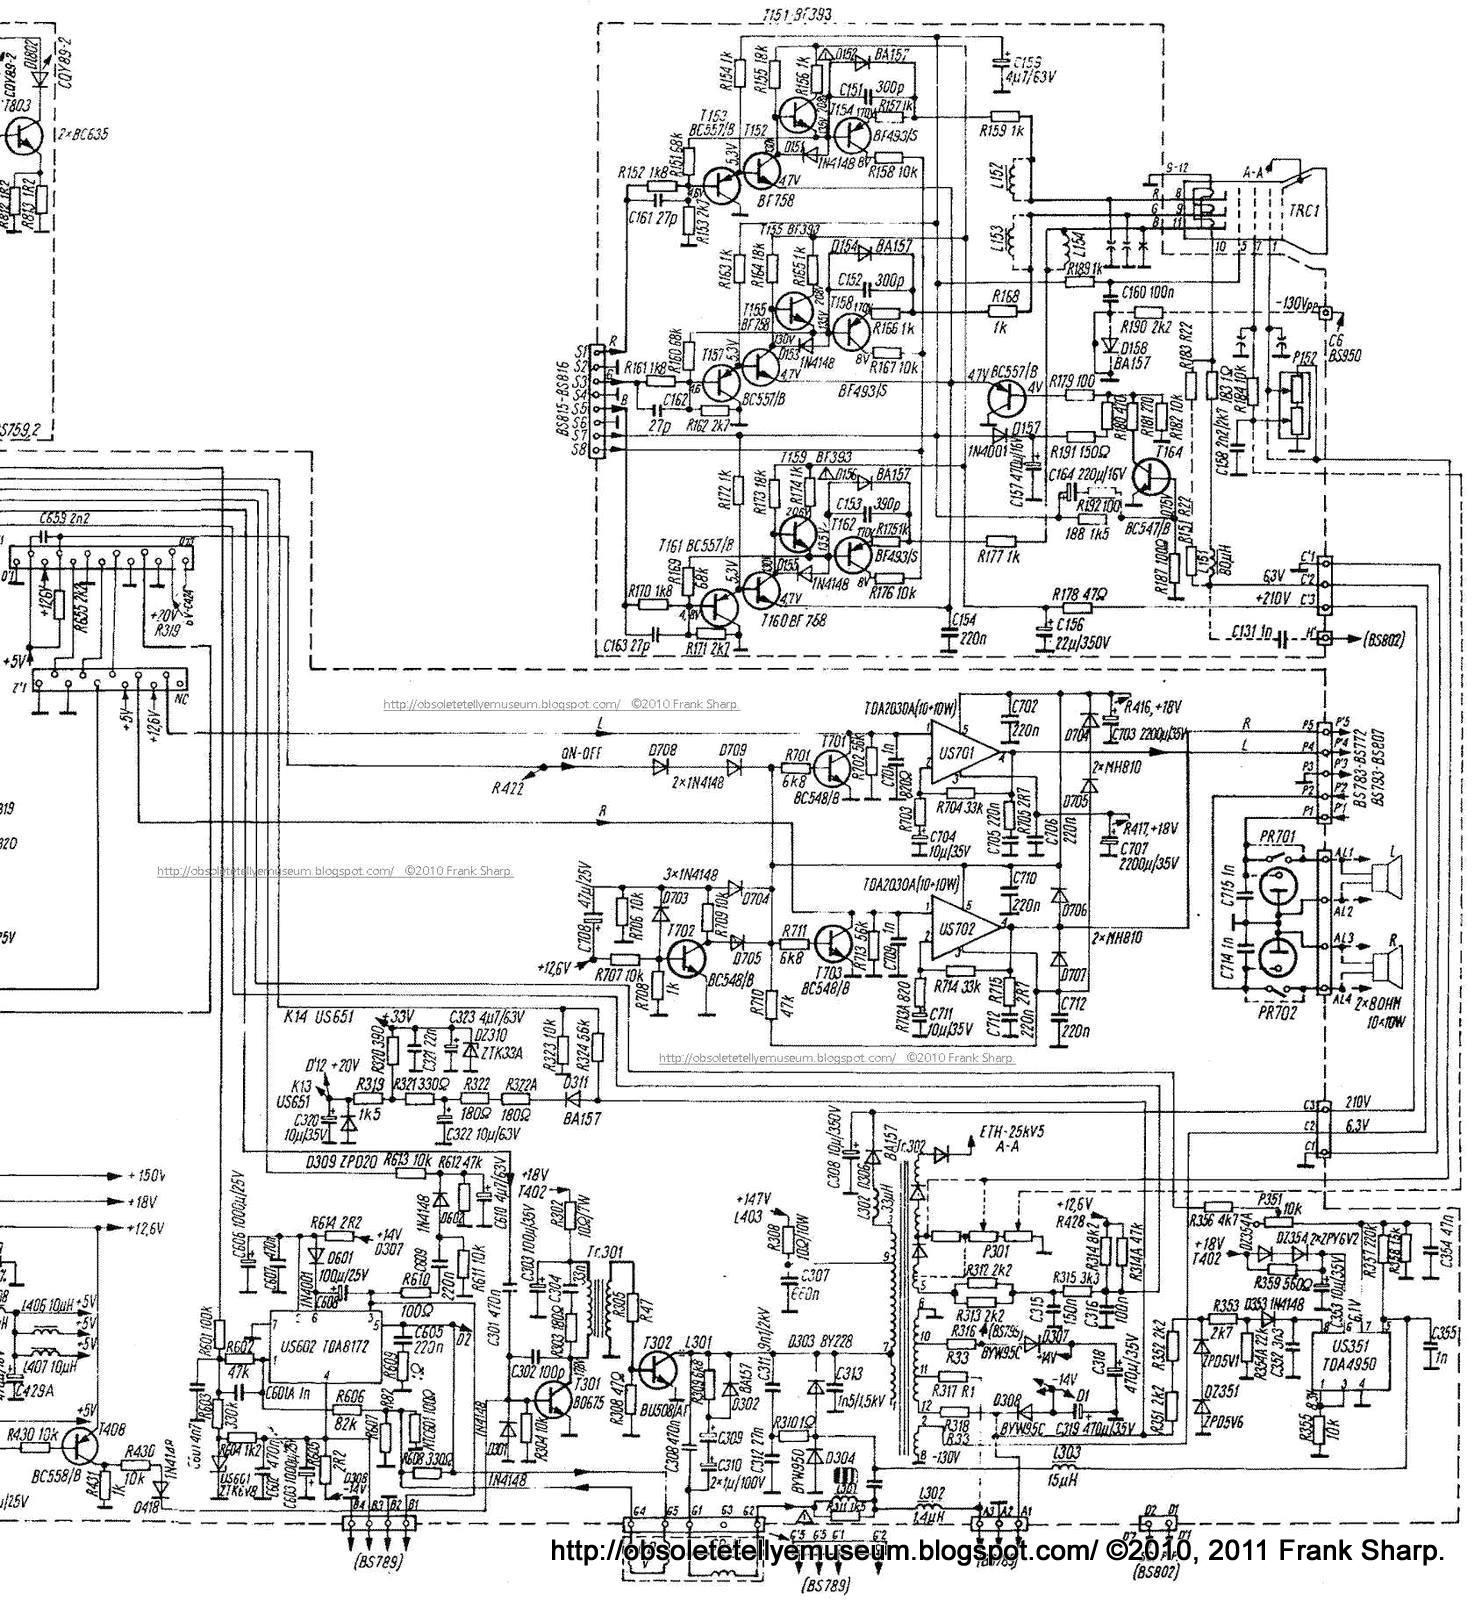 New Holland Parts Diagrams Besides Kubota Parts Diagram Moreover John